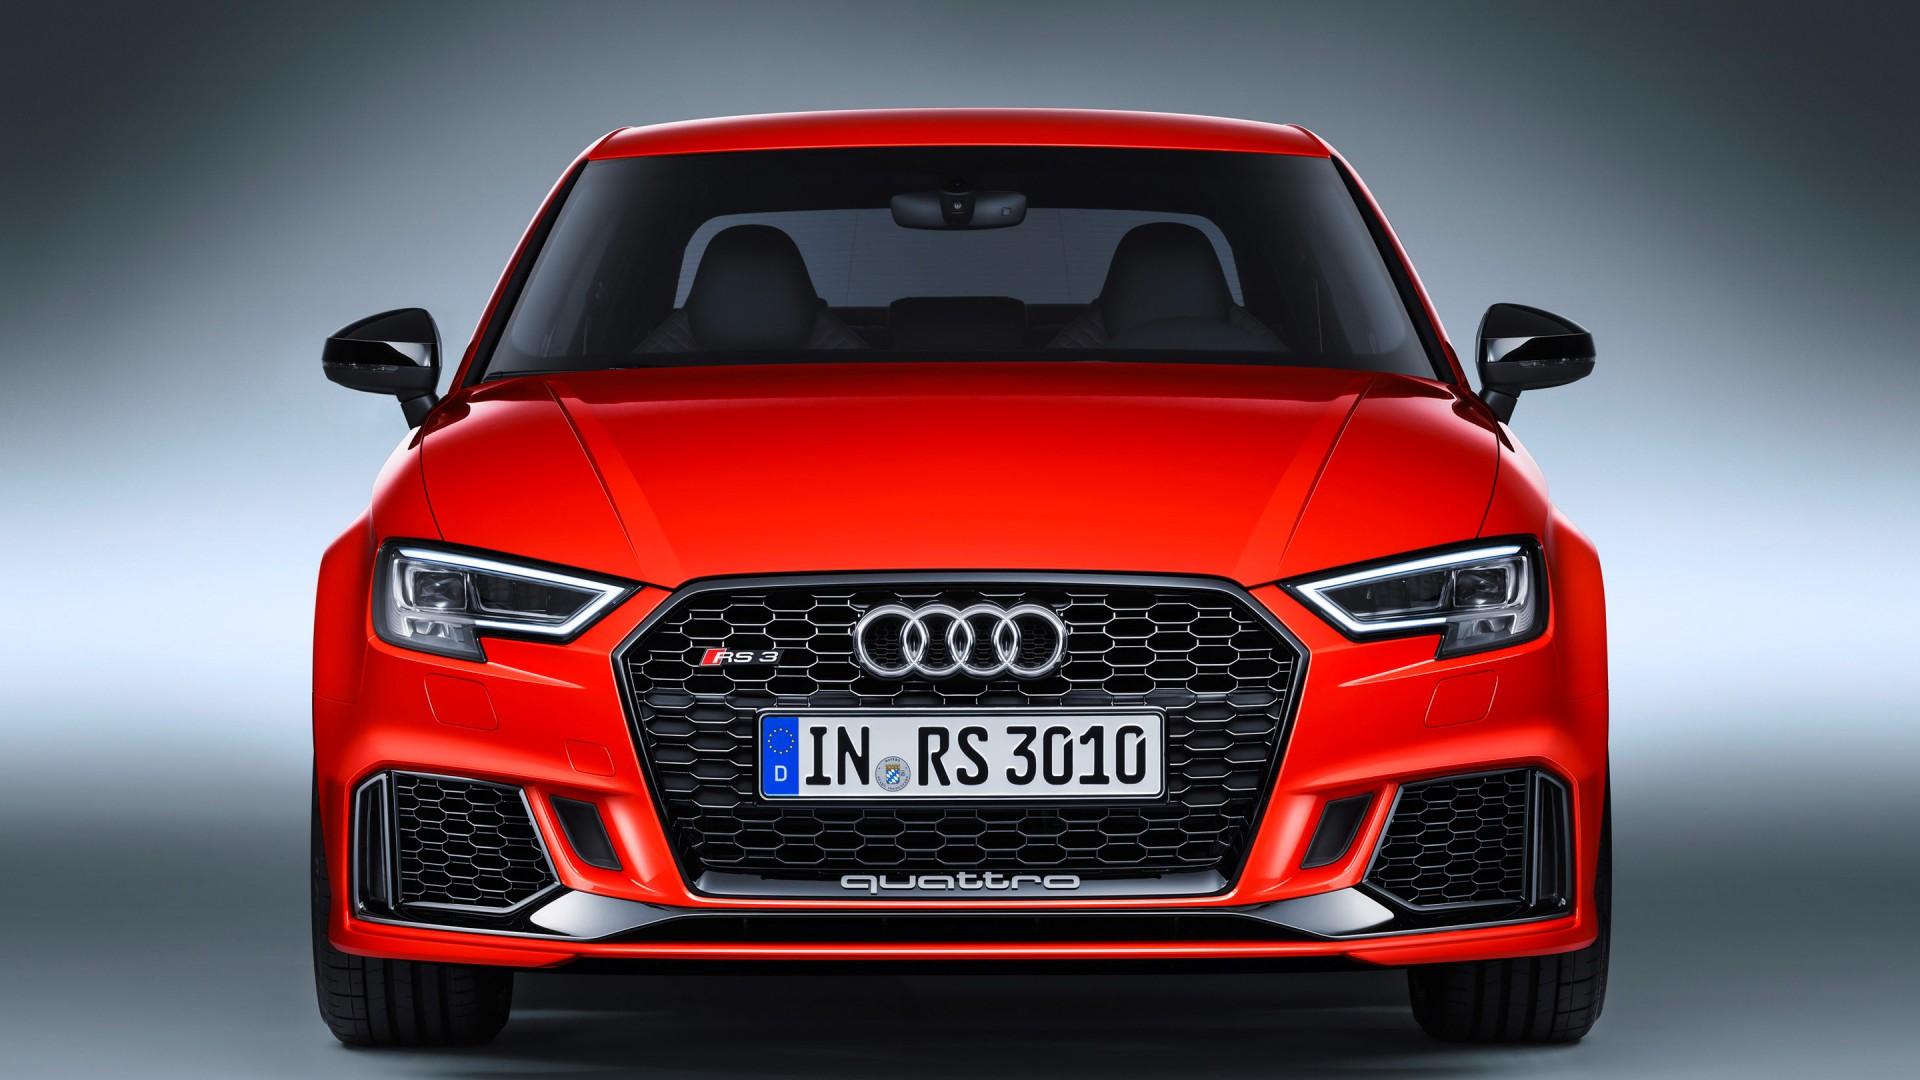 Audi R8 Hd Widescreen Wallpapers 1080p 2017 Audi Rs3 Wallpaper Hd Car Wallpapers Id 7036